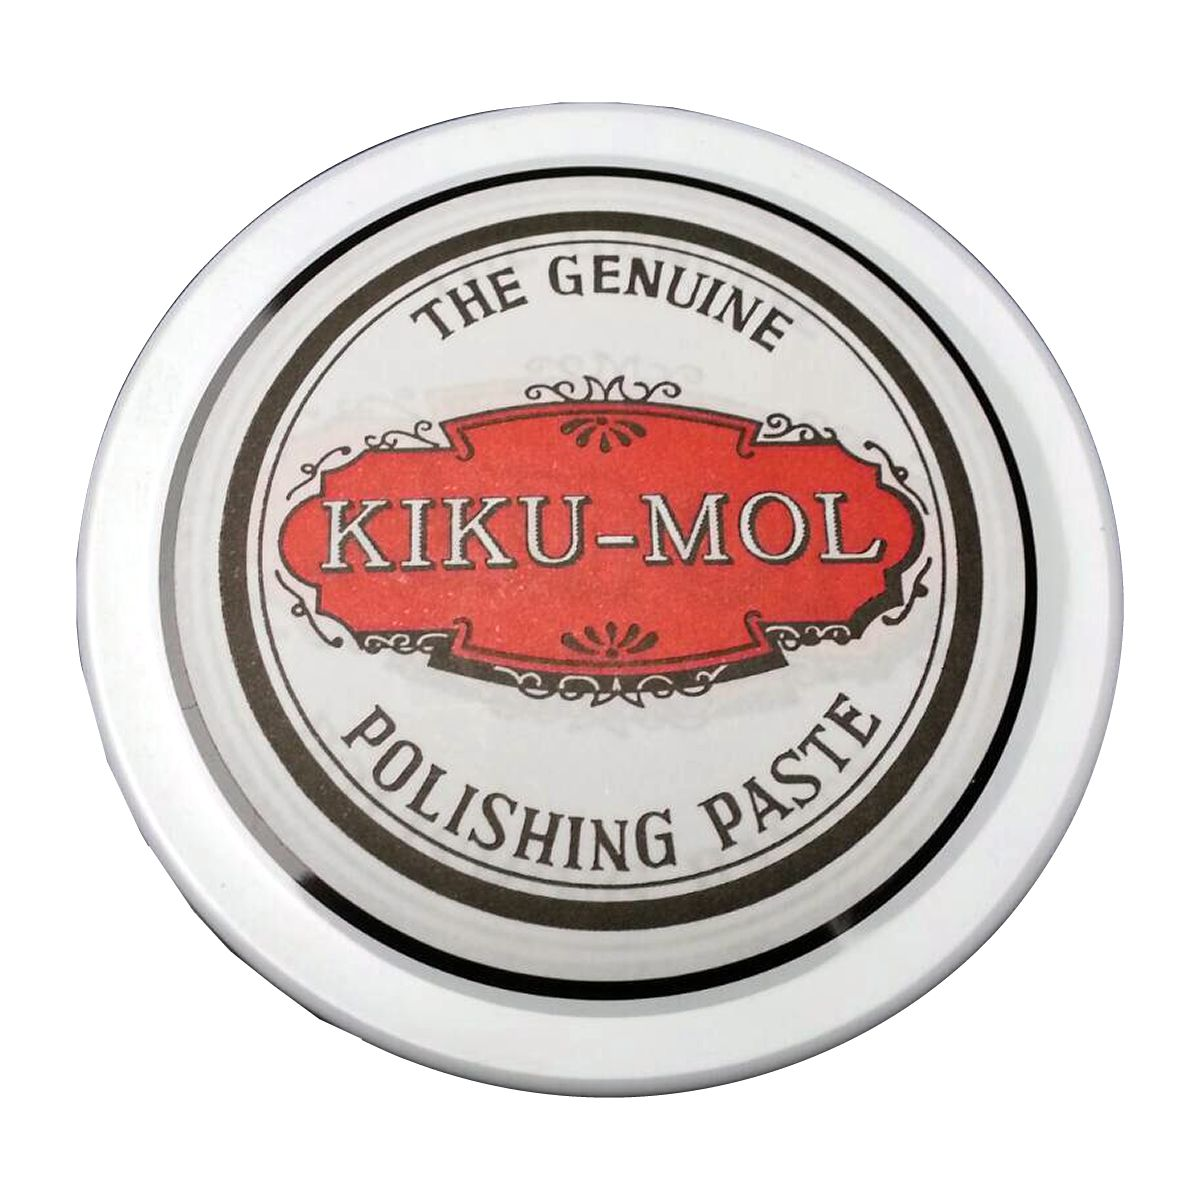 KIKU-MOOL キクモール 50g入